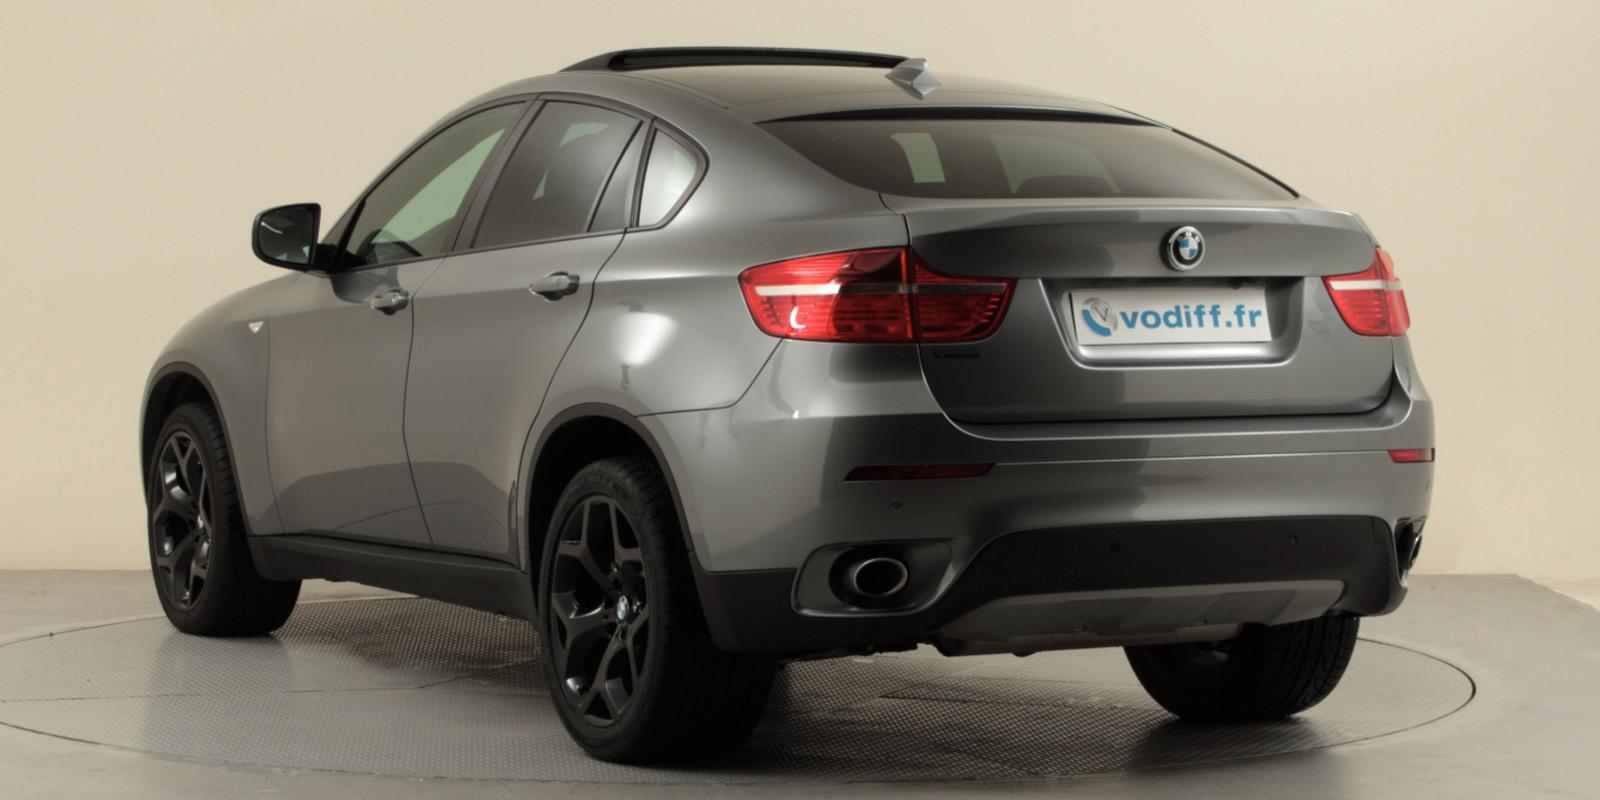 bmw x6 xdrive 4 0d 306 cv aut 5 places neuf 90 000 euros